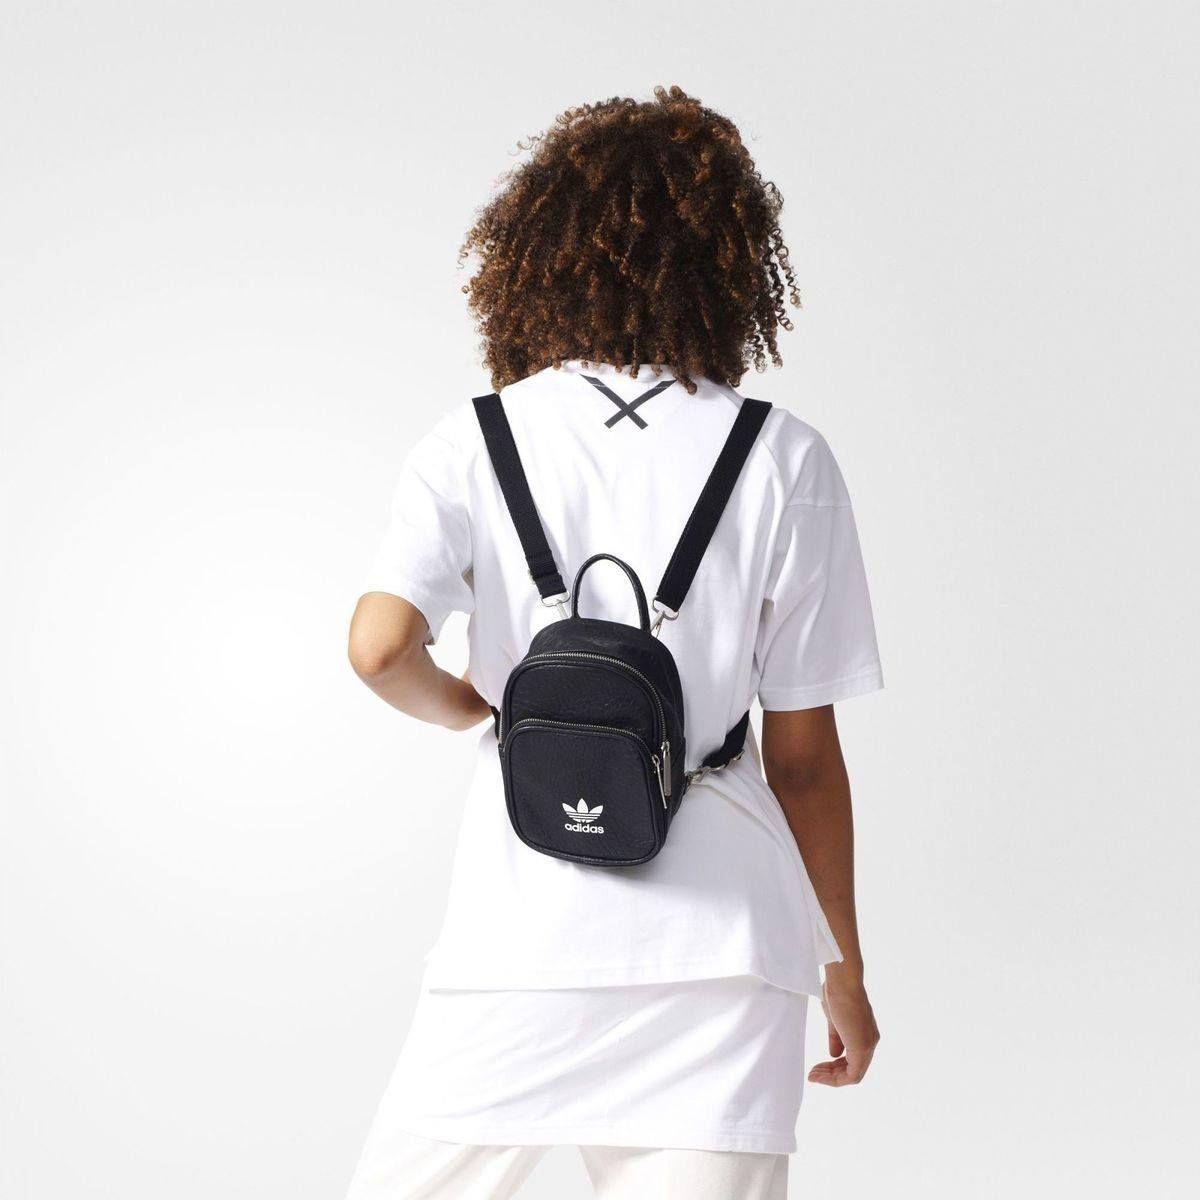 ADIDAS AC BACKPACK CLASSIC X MINI   Adidas backpack, Mini ...